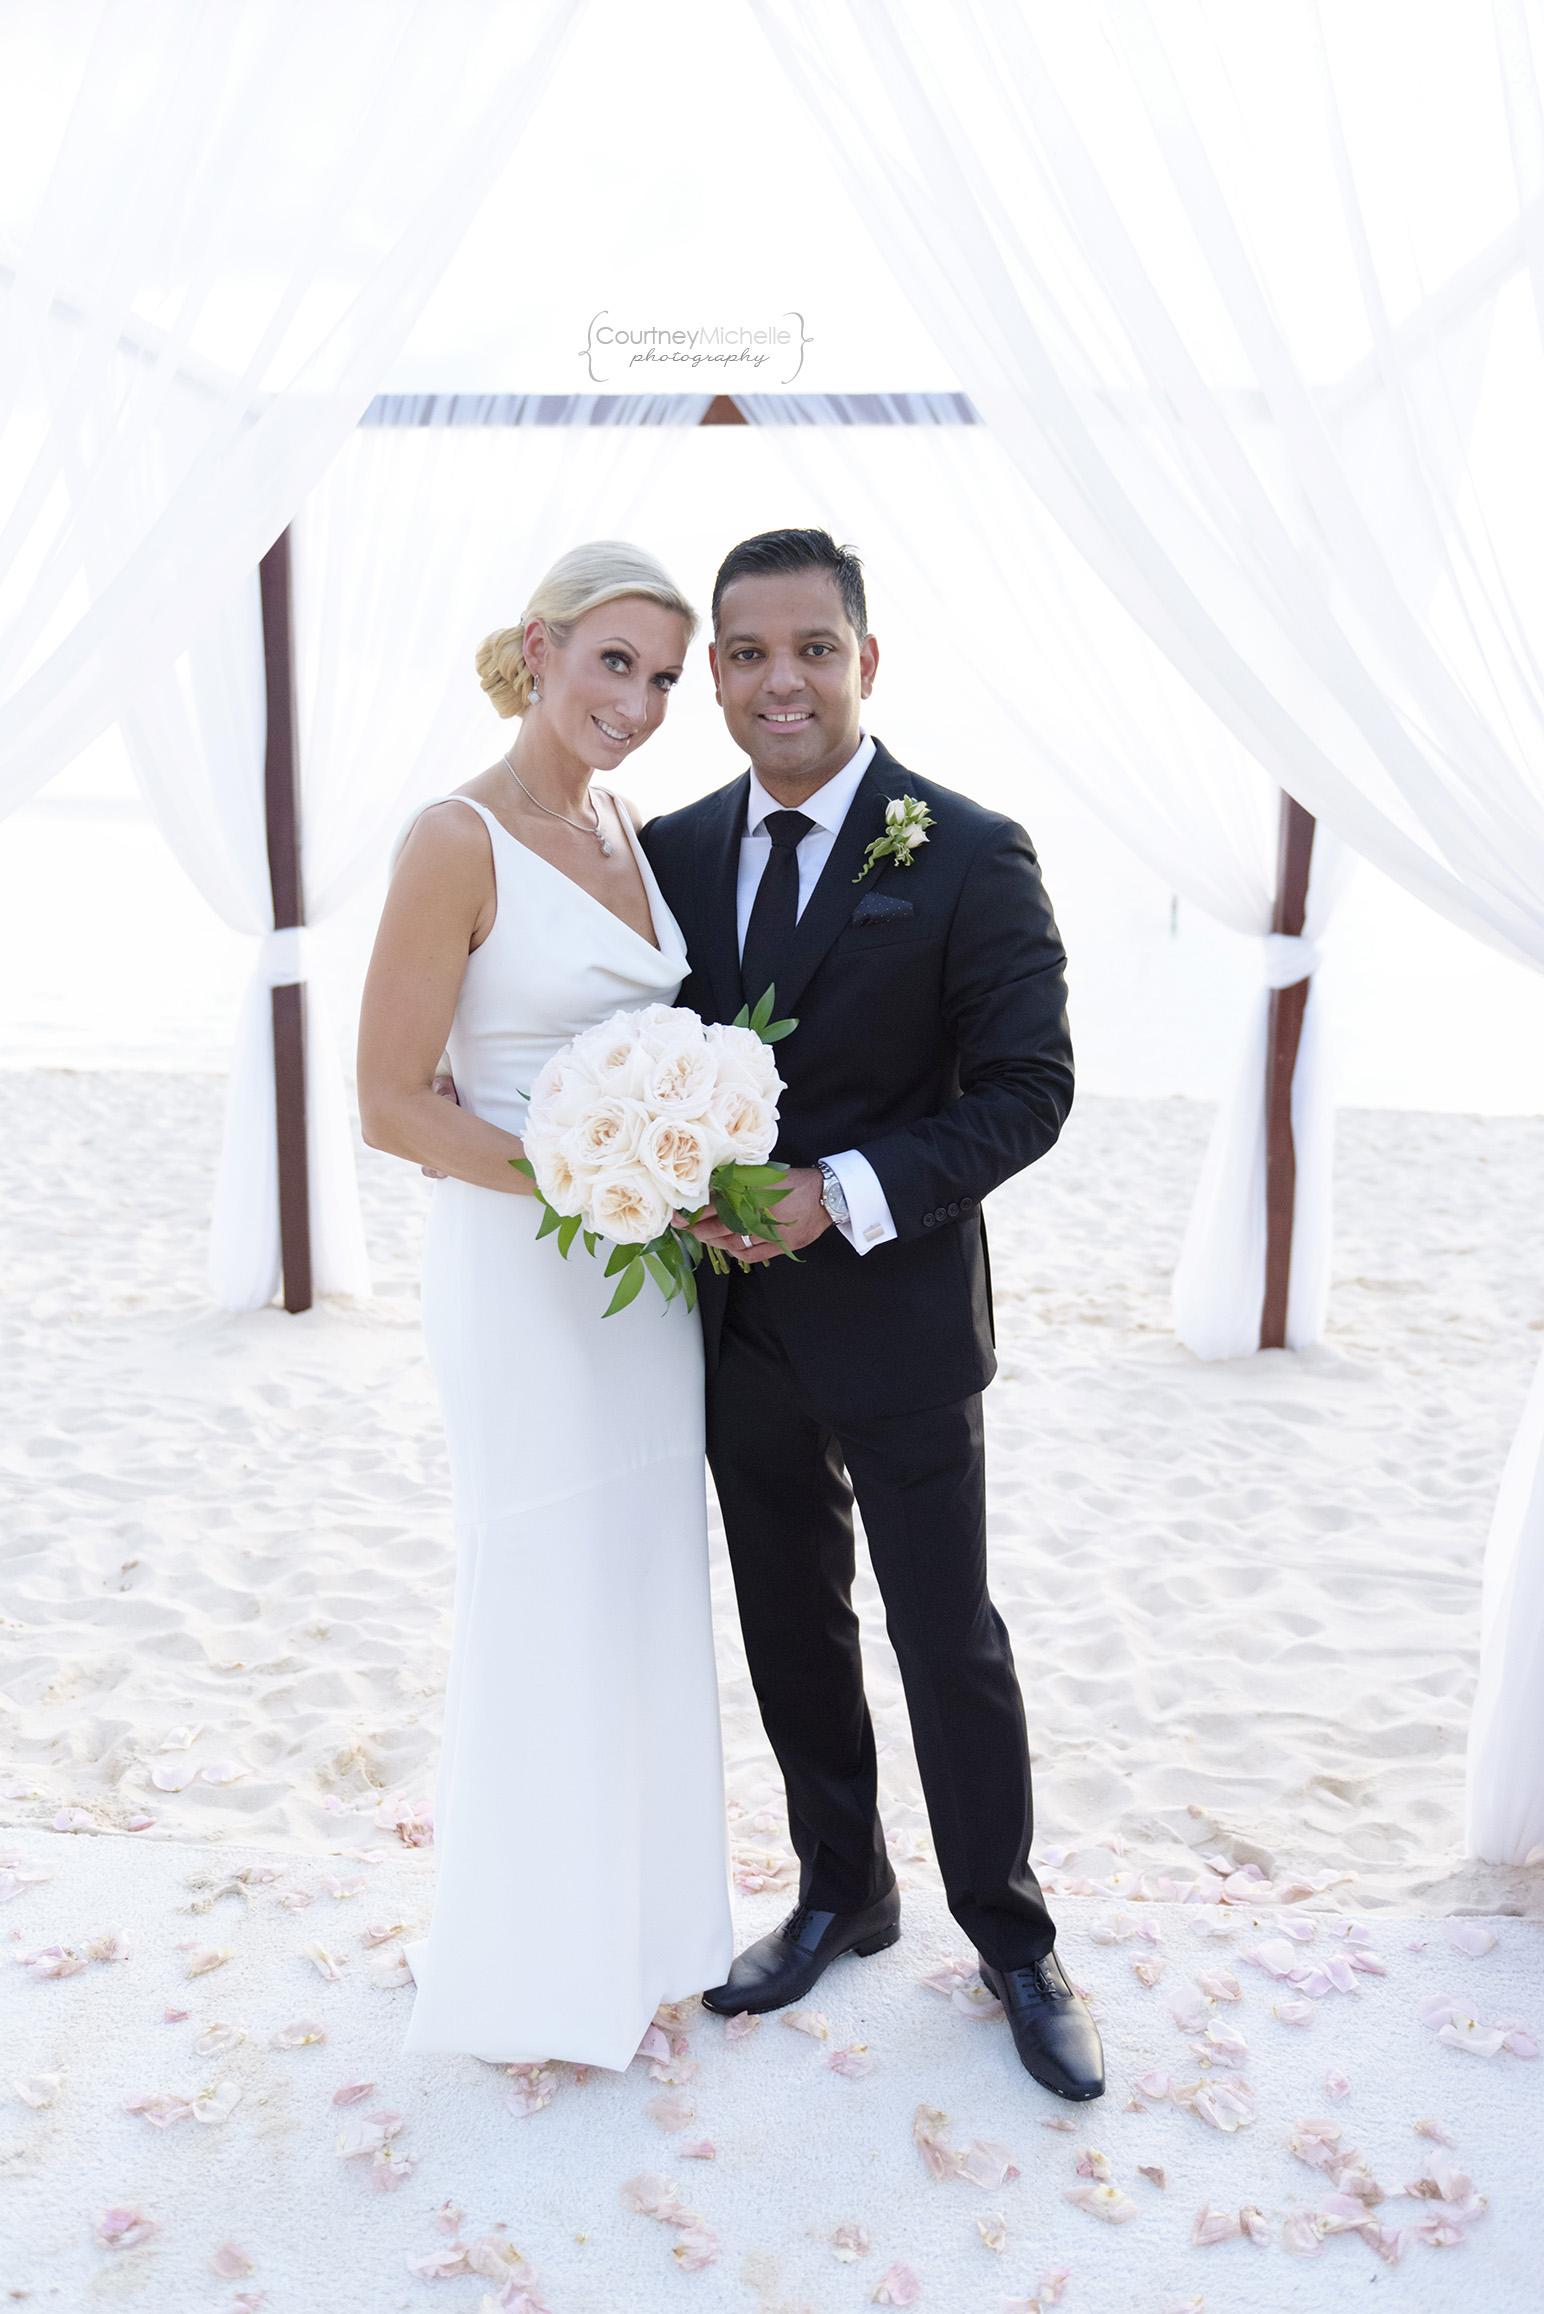 bride-and-groom-portrait-grand-cayman-beach-wedding-photography-by-courtney-laper©CopyrightCMP-LeaAnneRaj-8045.jpg